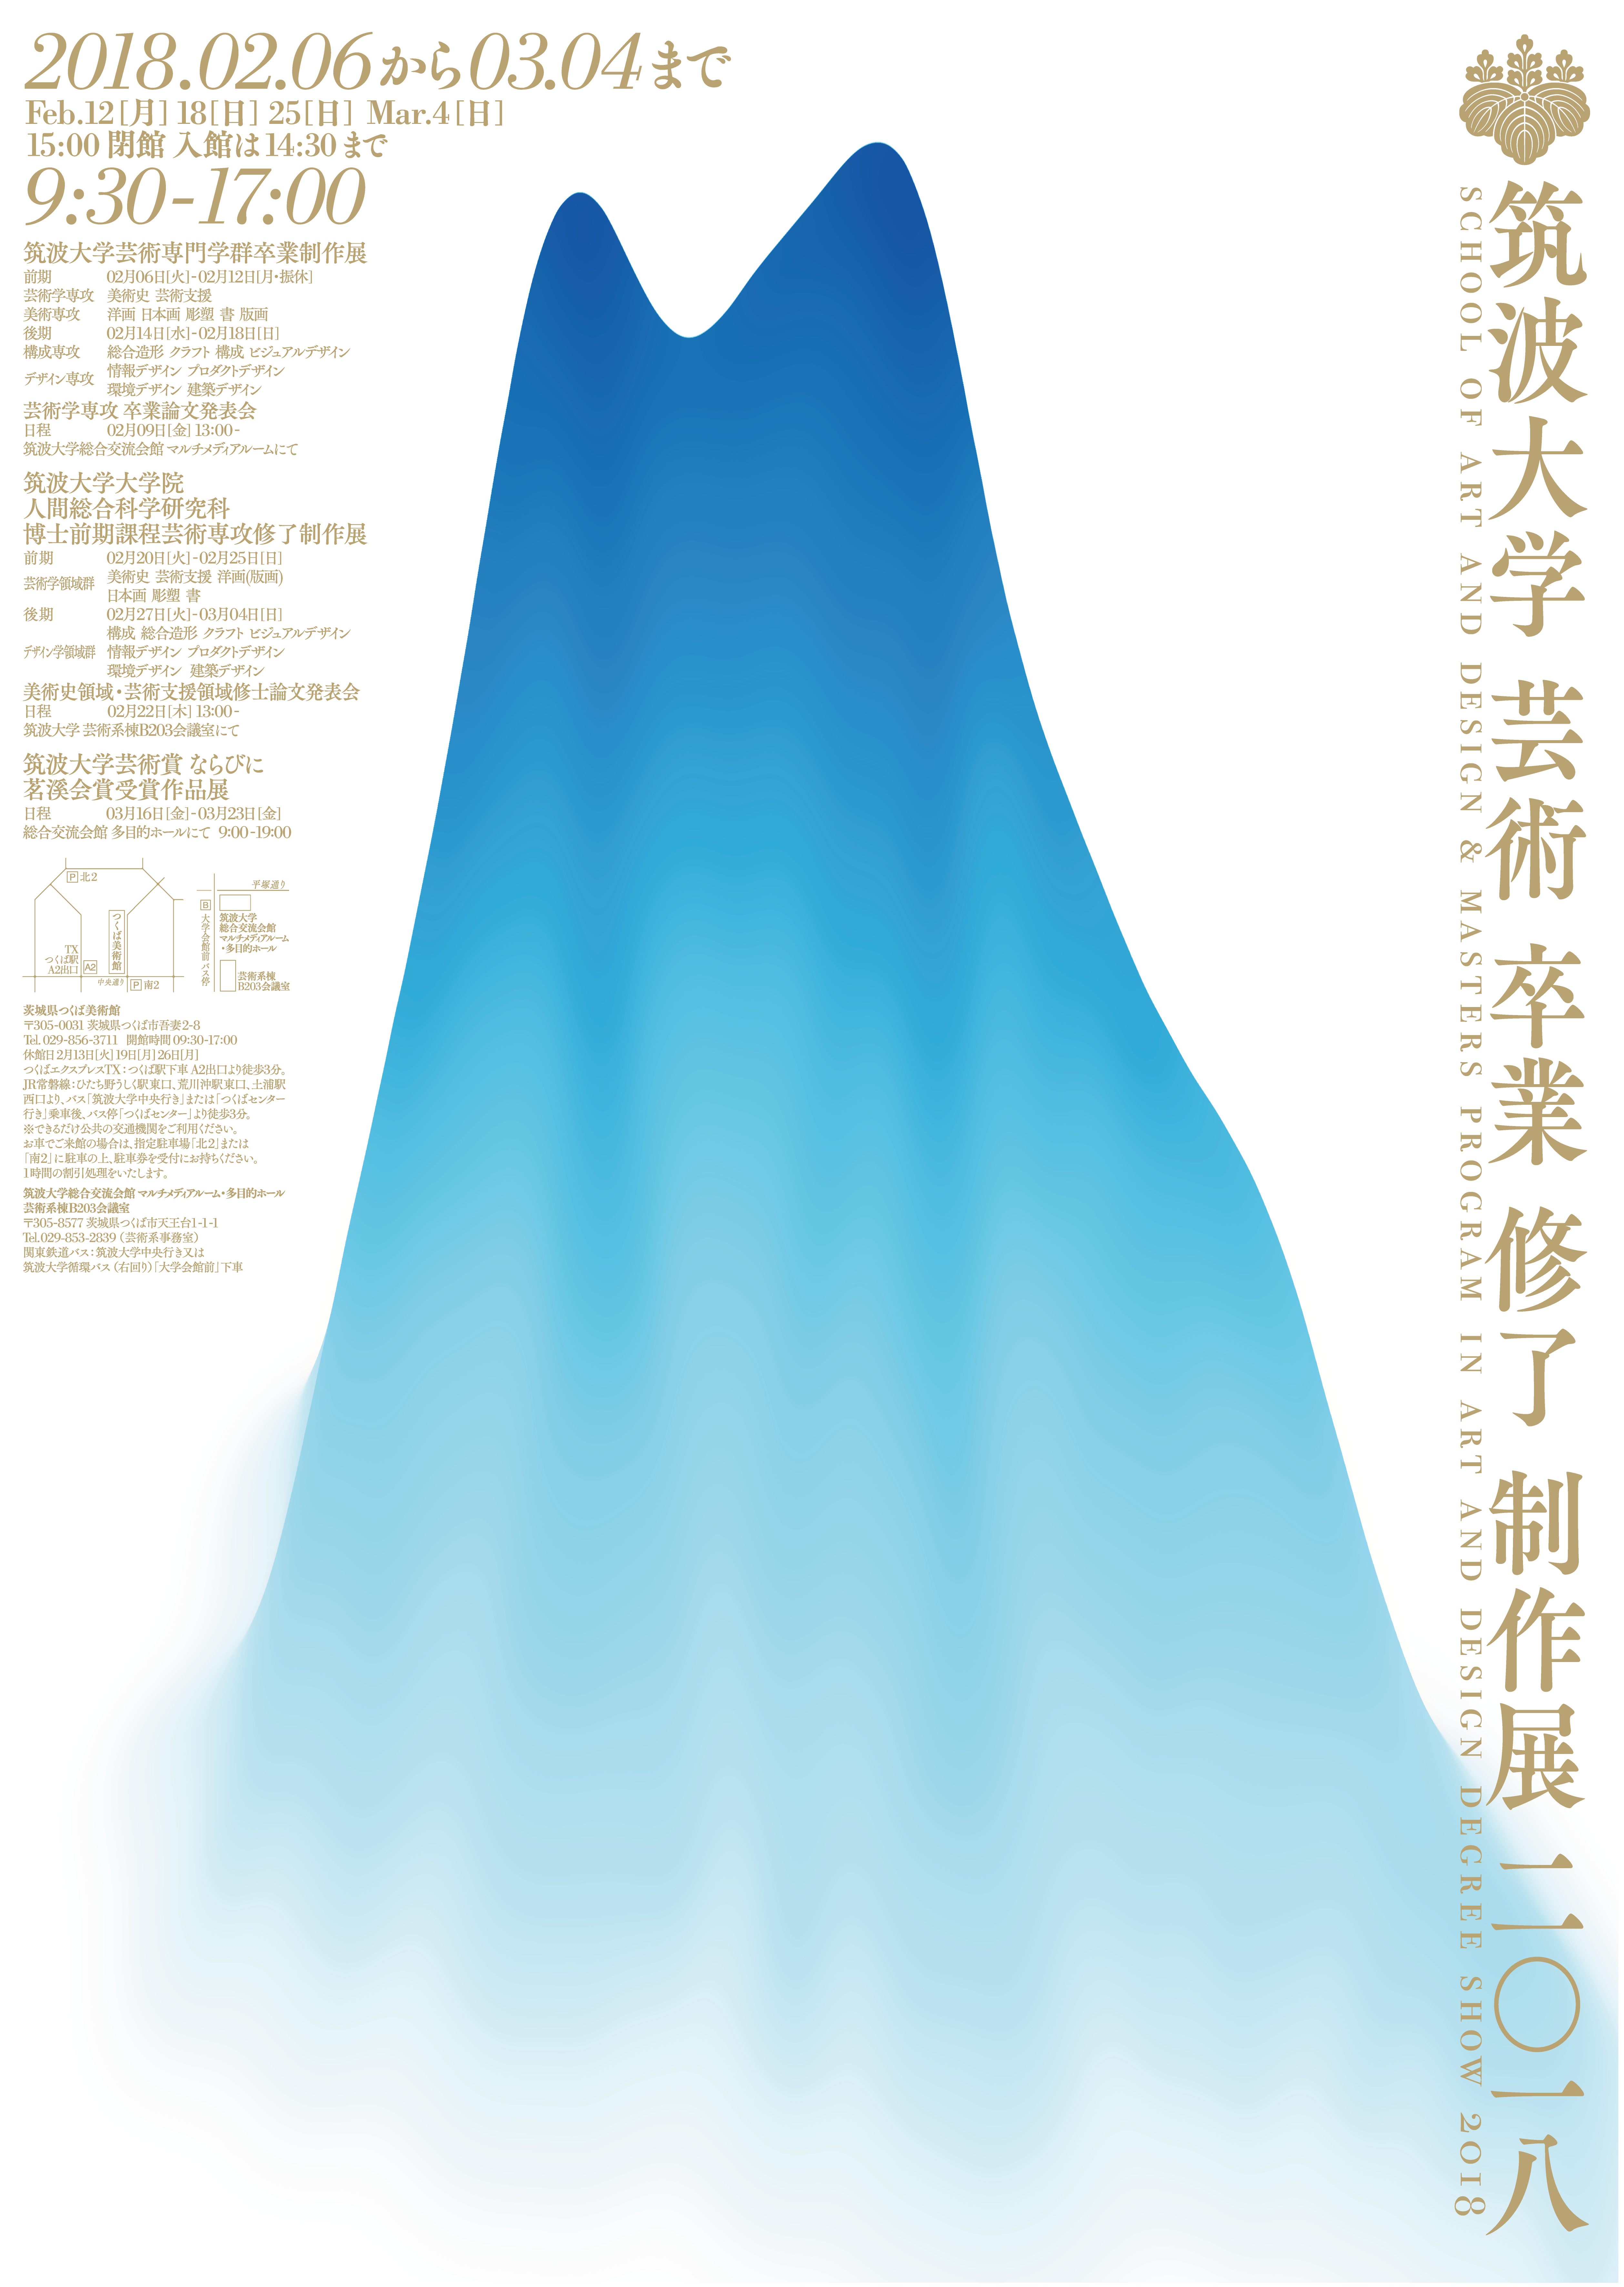 卒修展poster2017